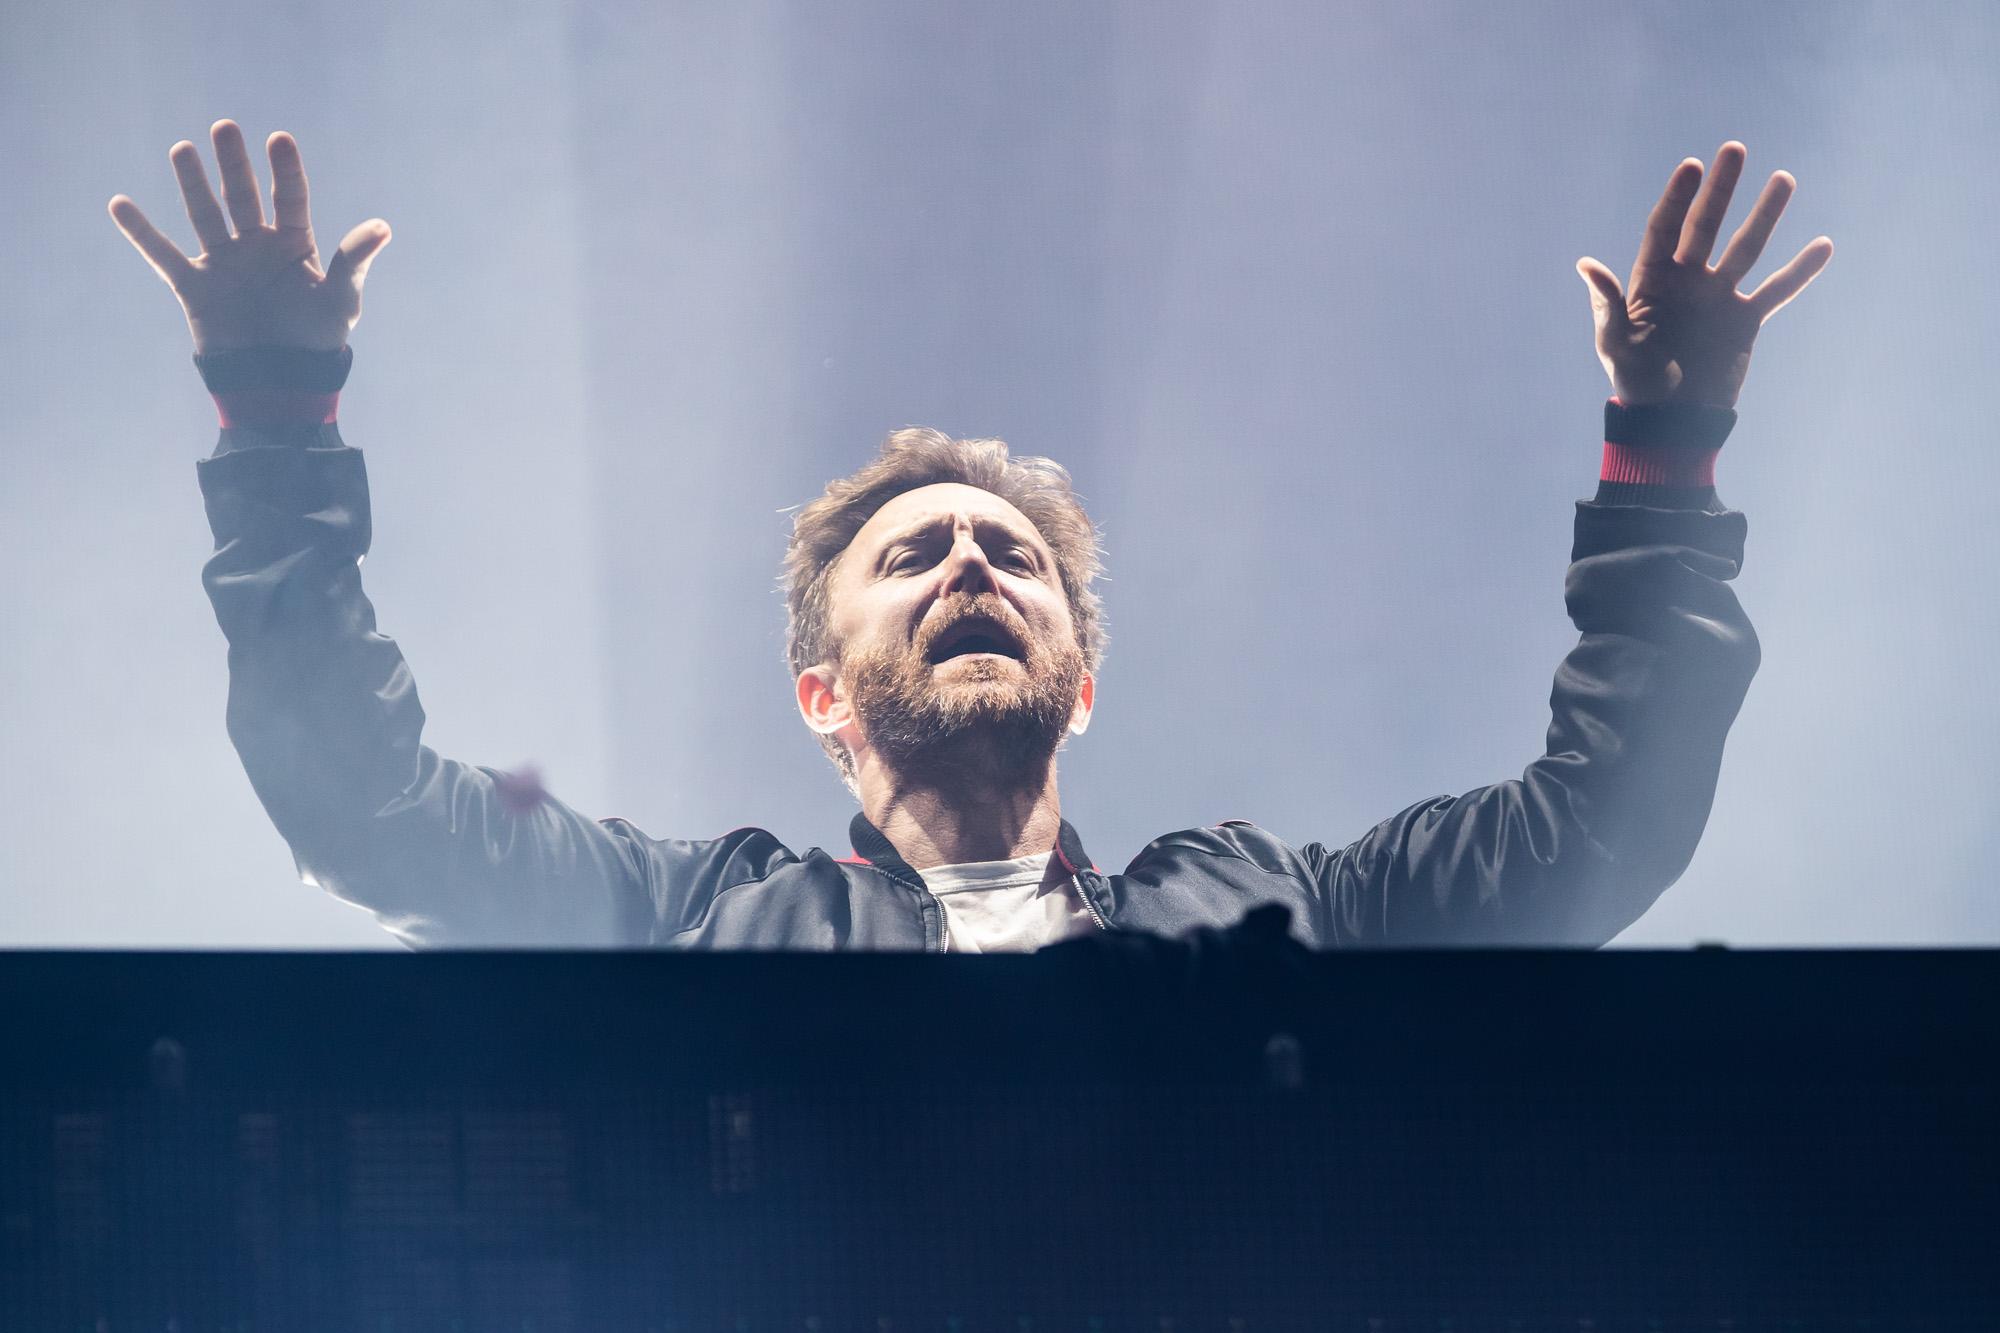 David Guetta @ Stavernfestivalen 2018